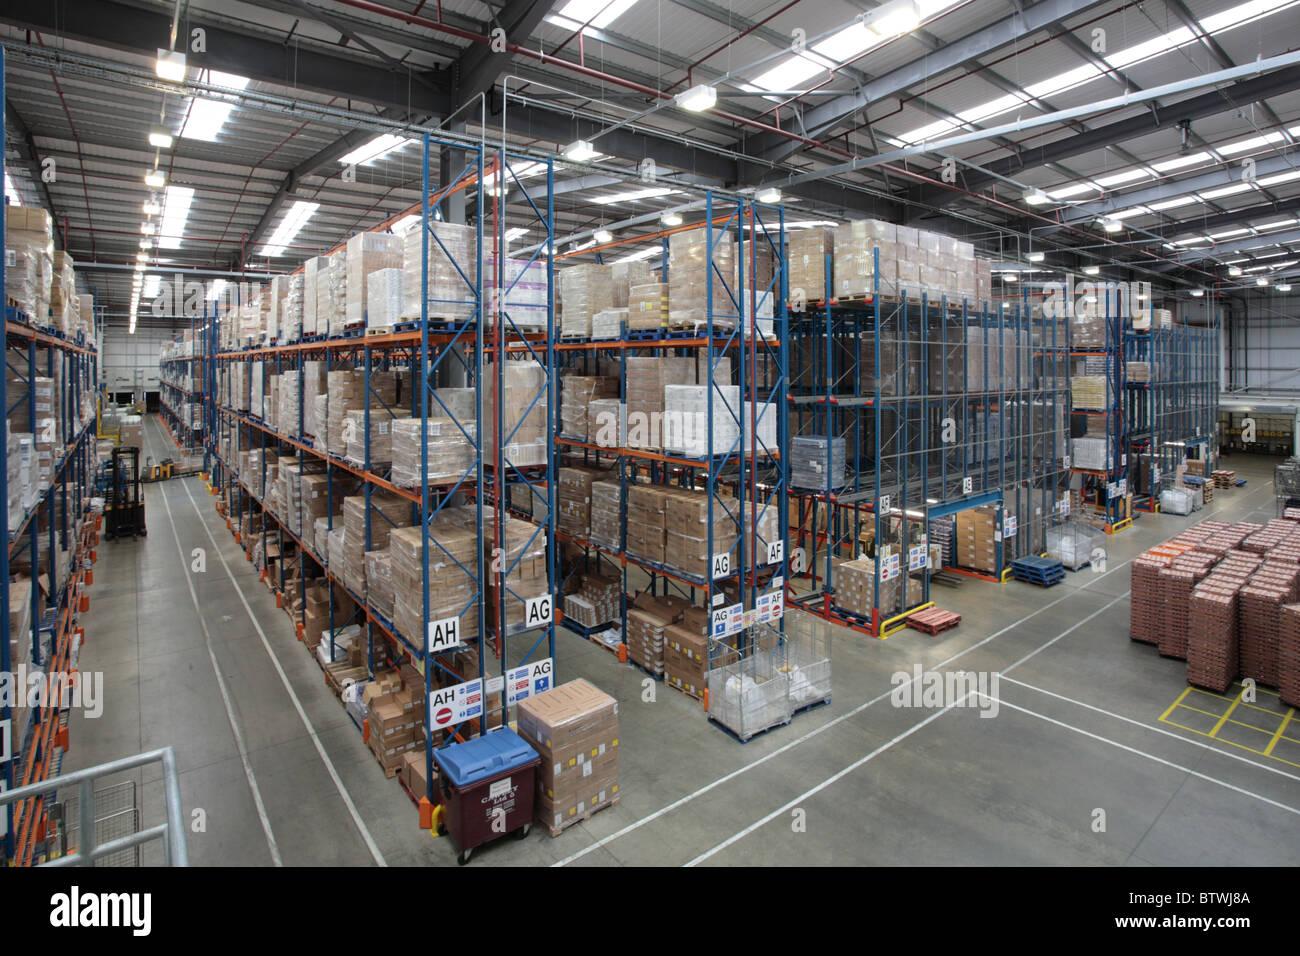 Distribution warehouse - Stock Image